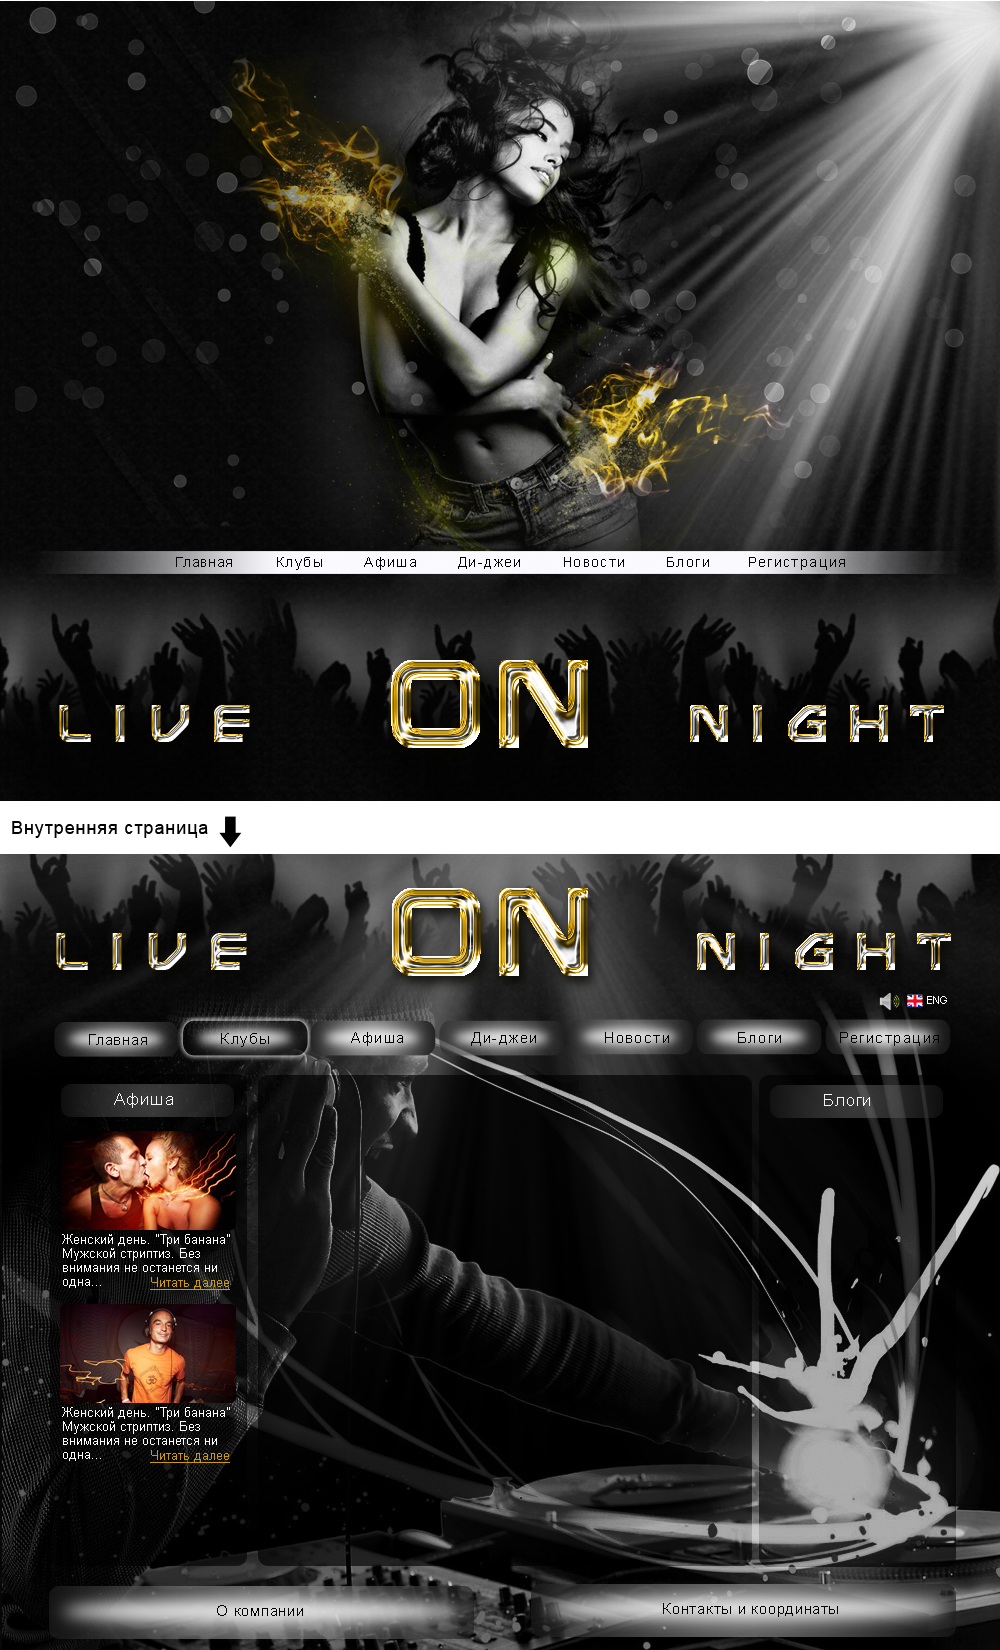 Live on night